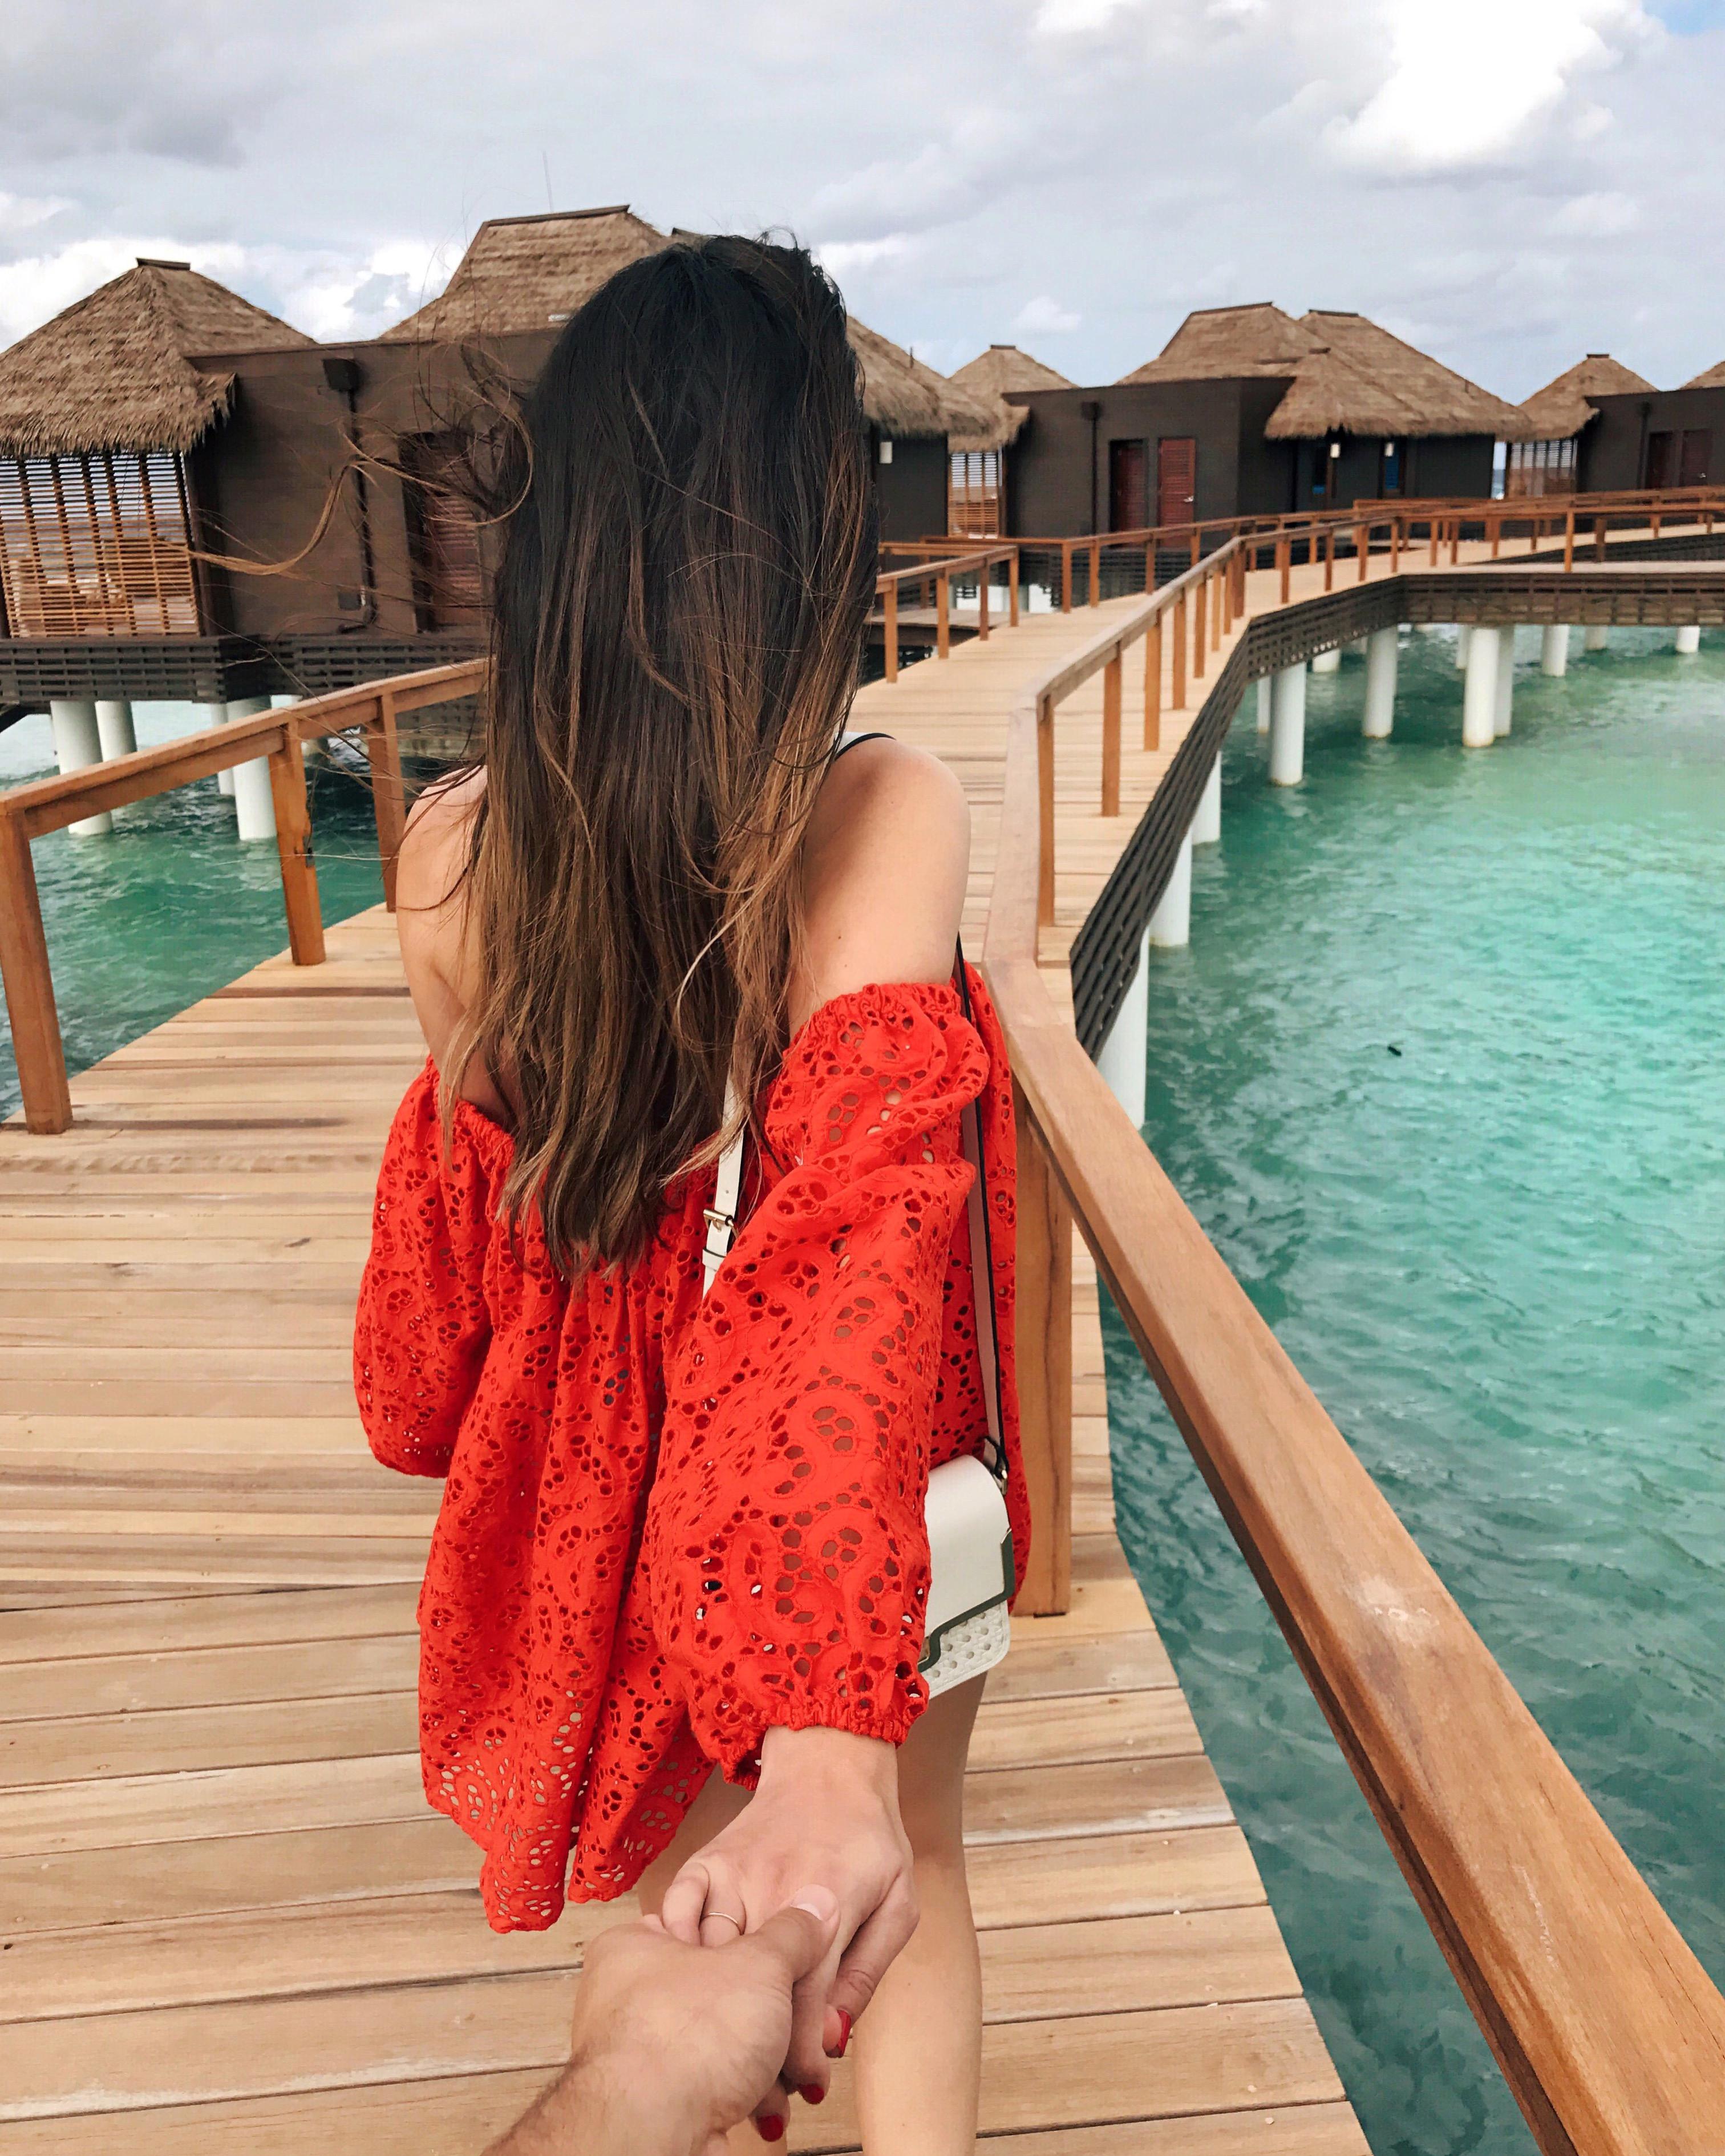 Overwater Villas Overwater Bungalows Vacation Caribbean